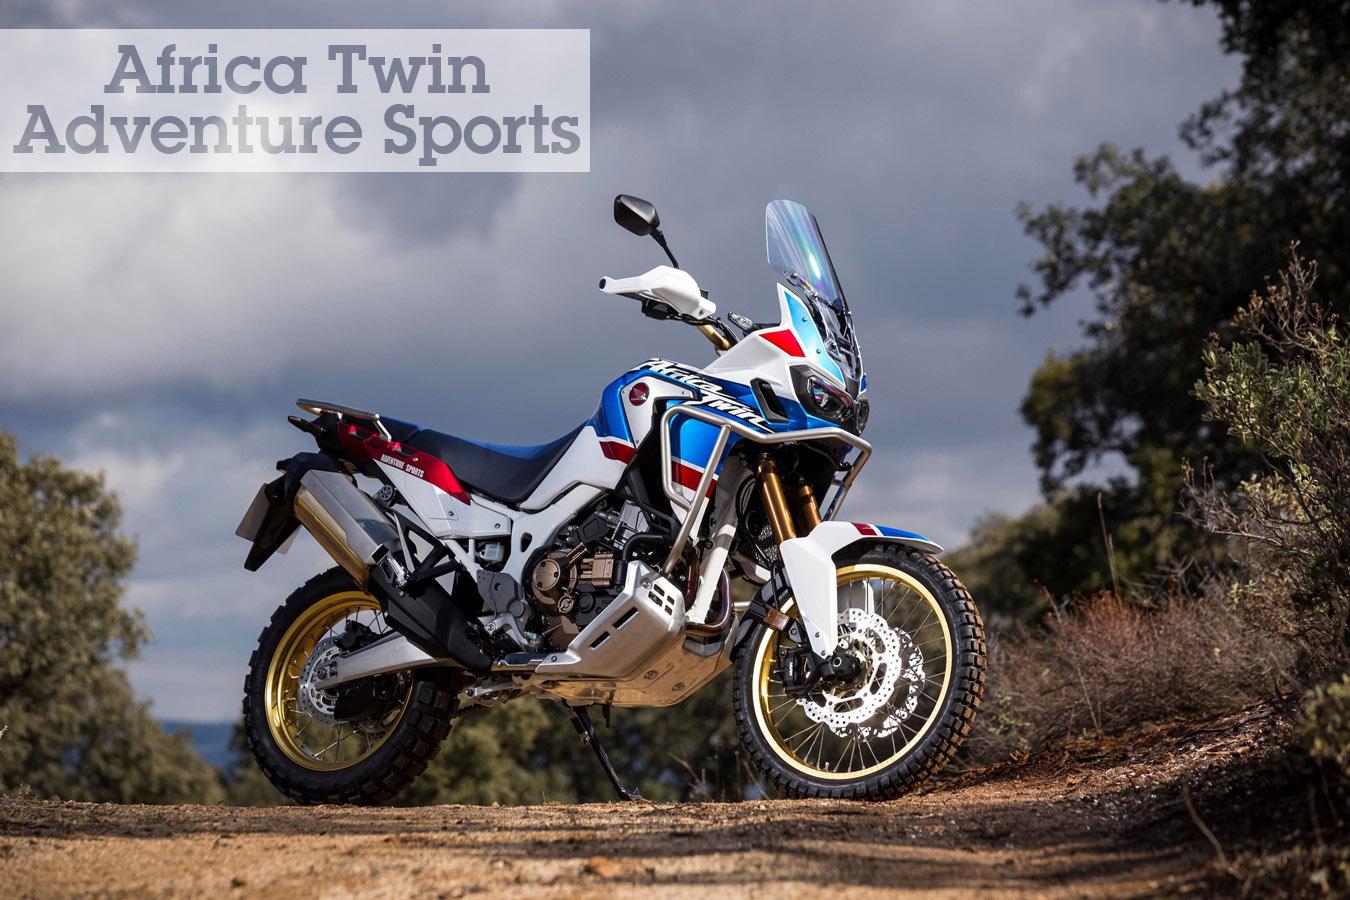 Honda Africa Twin Adventure Sports CRF1000L